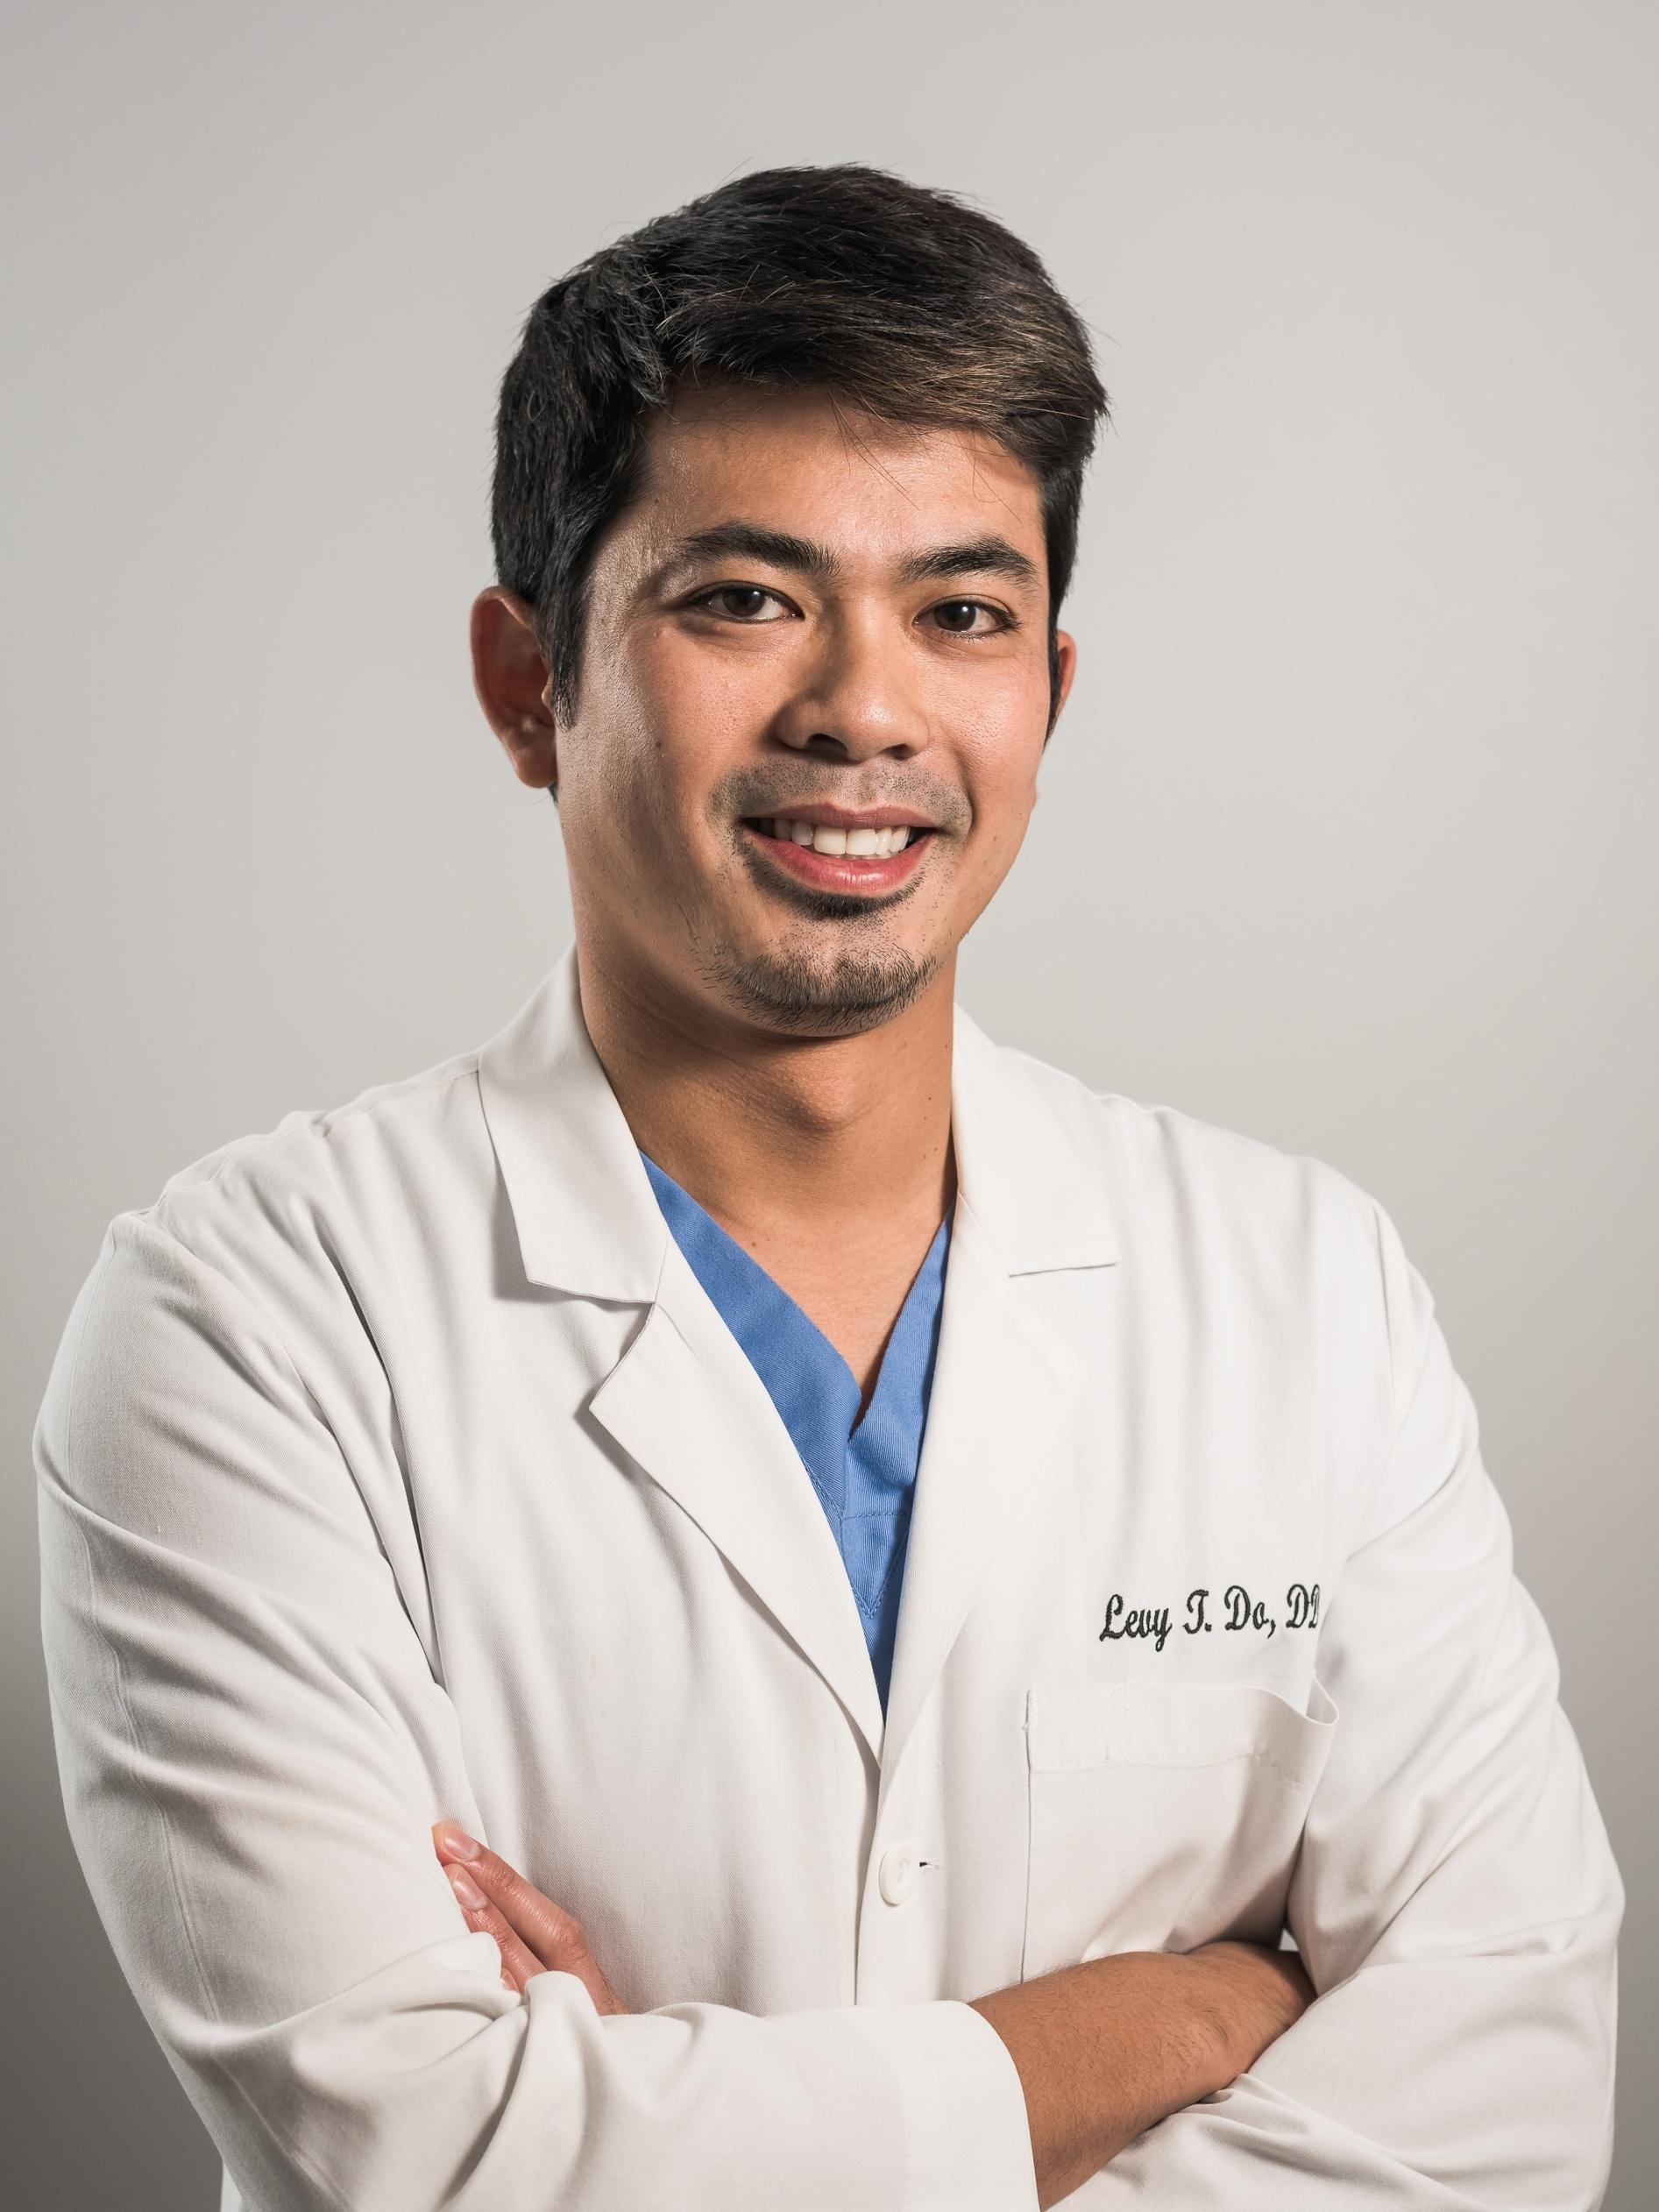 Levy Do, DDS - Dental Director -